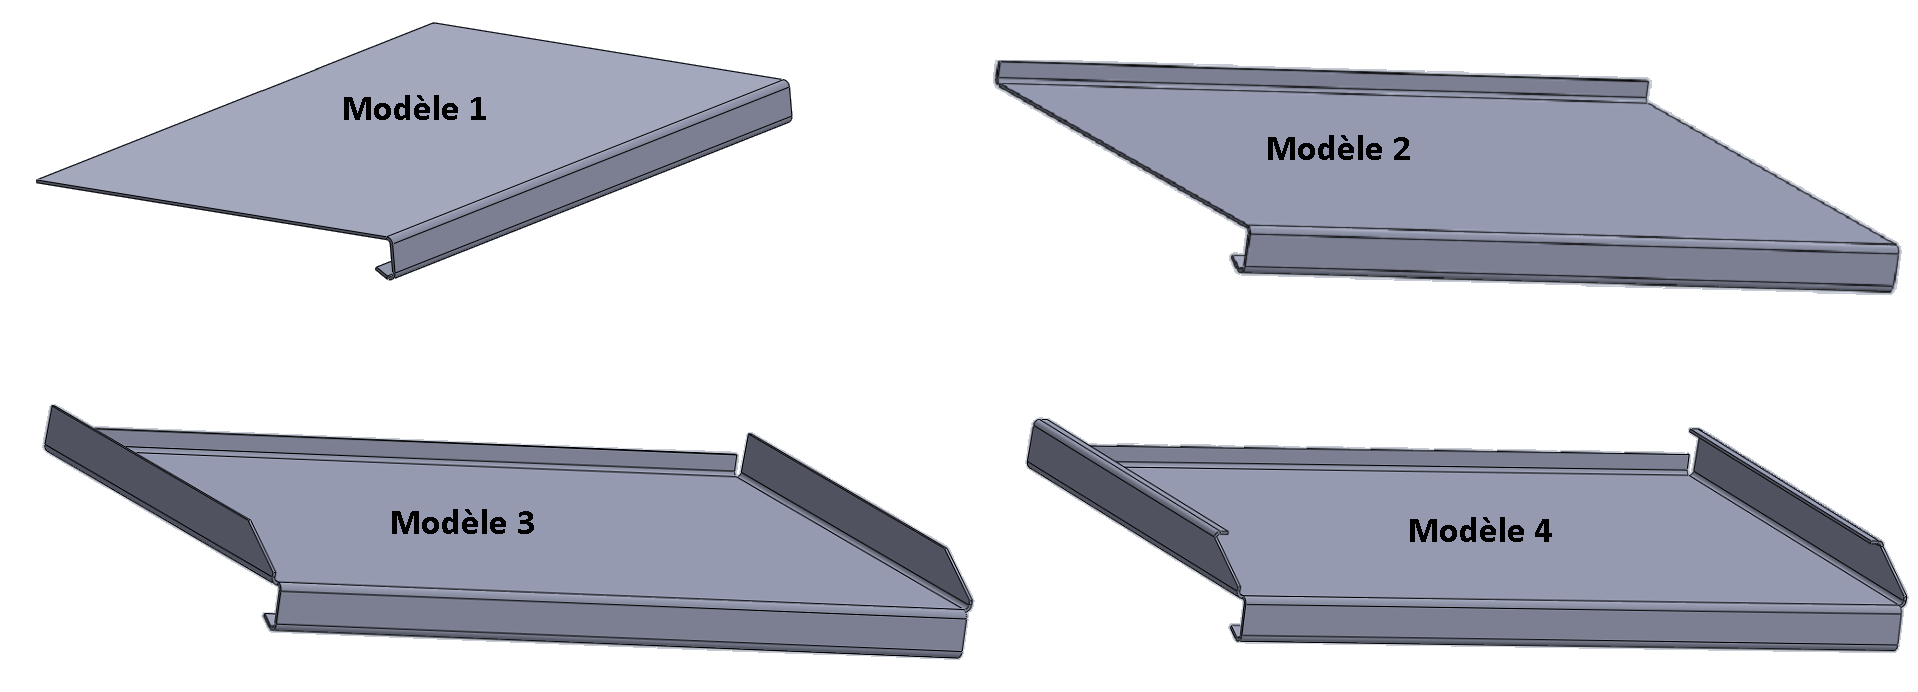 tablettes de fen tre t le laser s rl. Black Bedroom Furniture Sets. Home Design Ideas